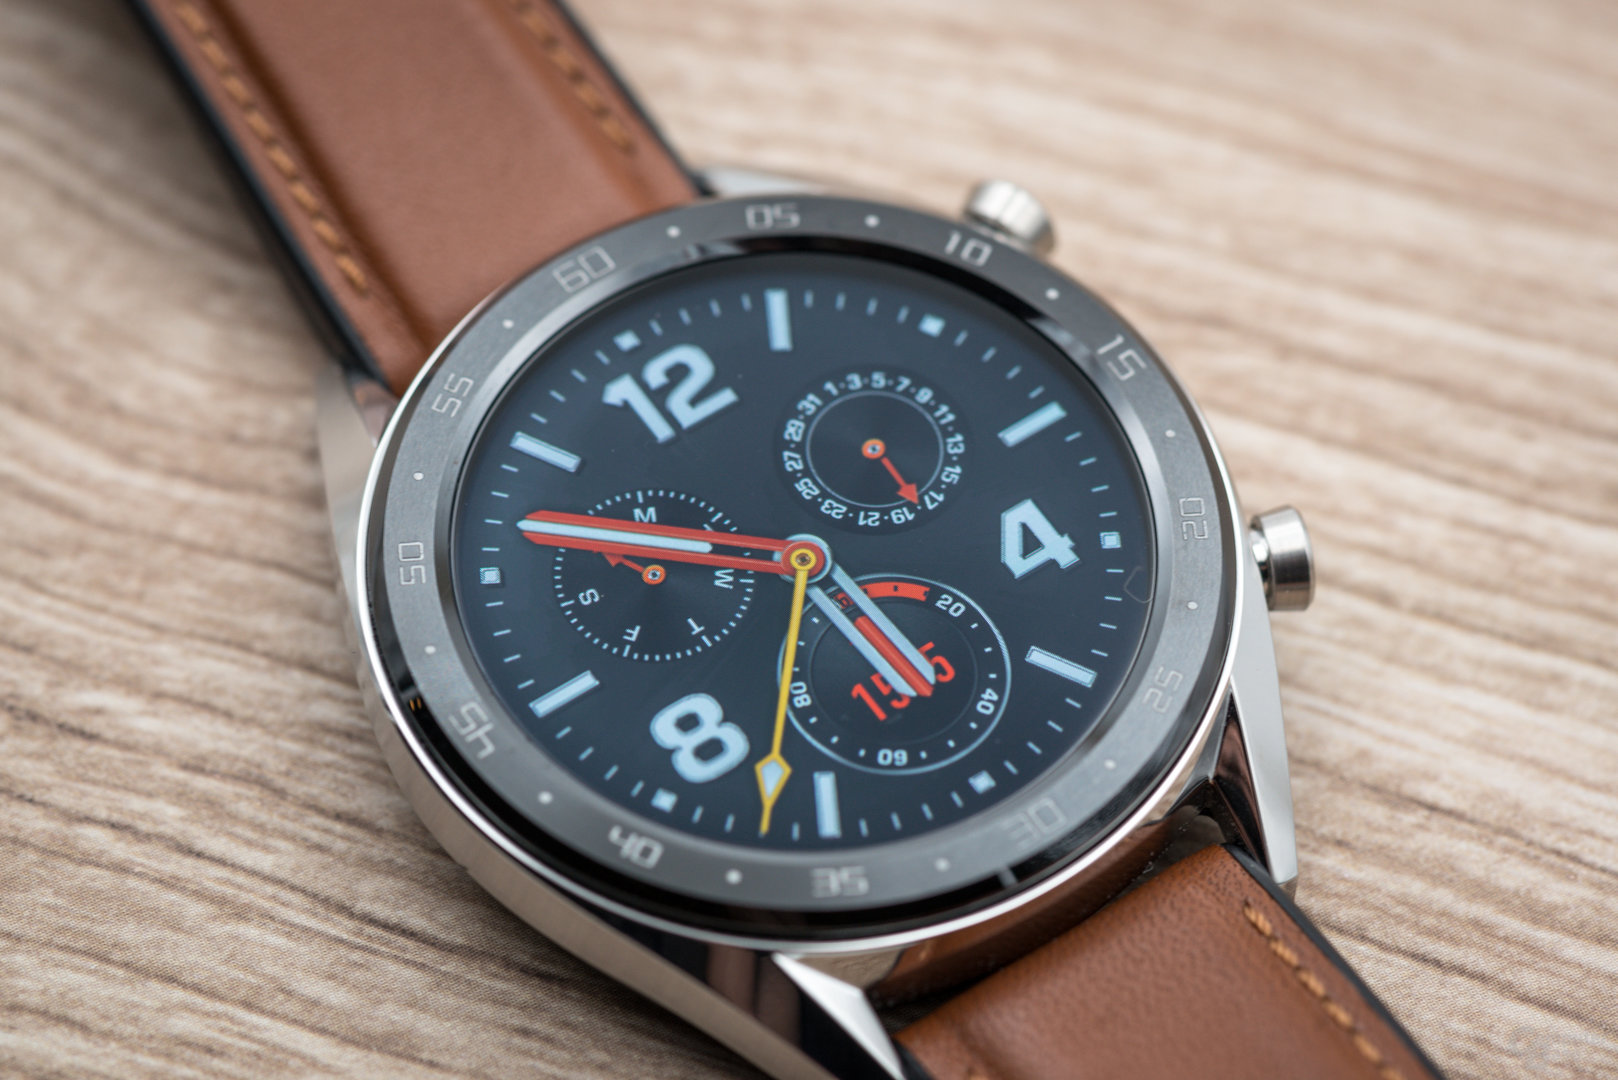 Huawei Watch GT: Display